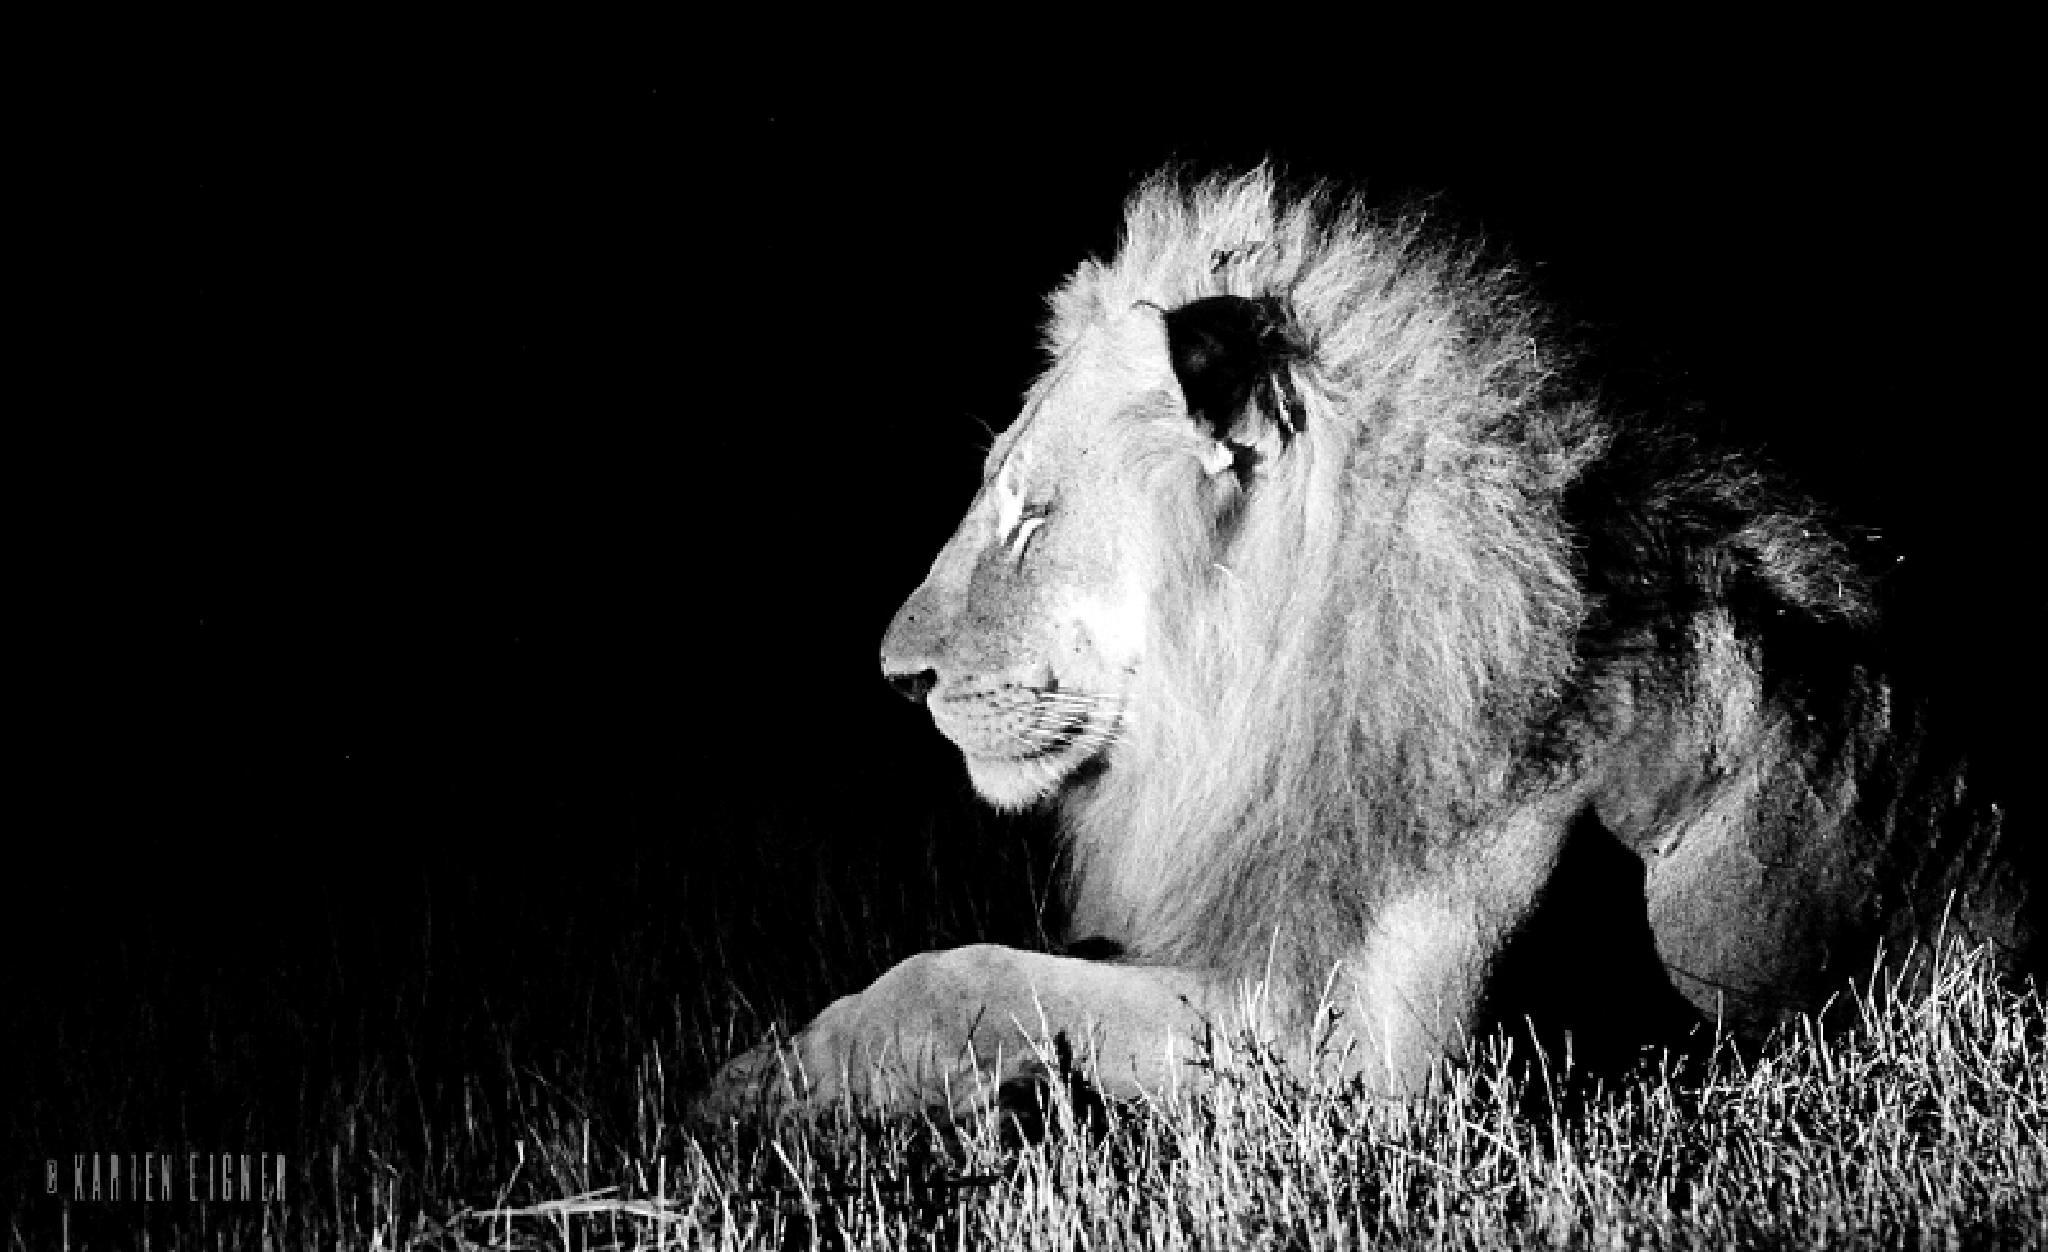 Male lion by Karien Eigner